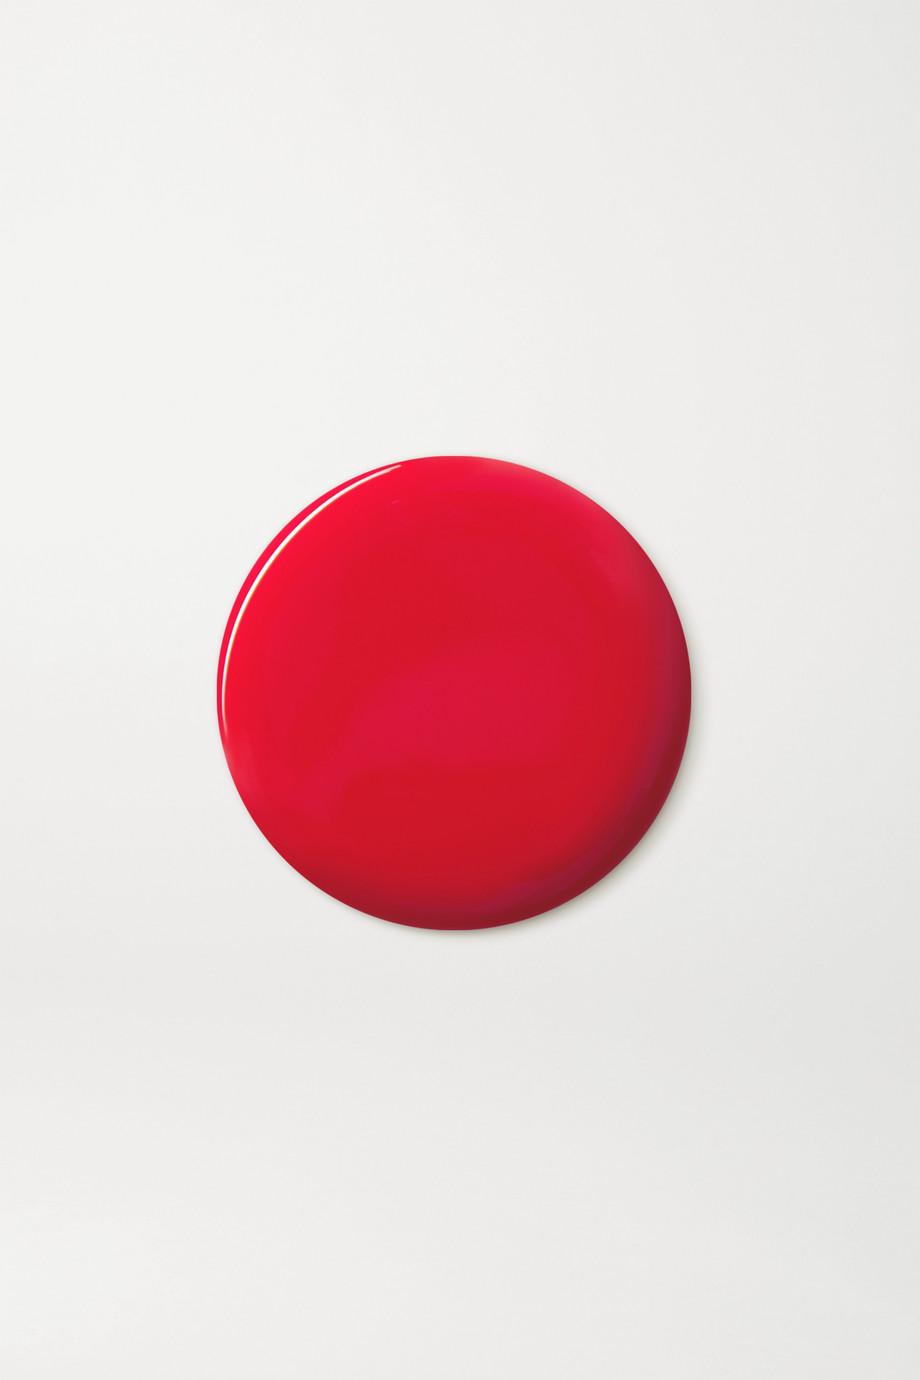 Christian Louboutin Beauty Matte Nail Color - Jamais Assez